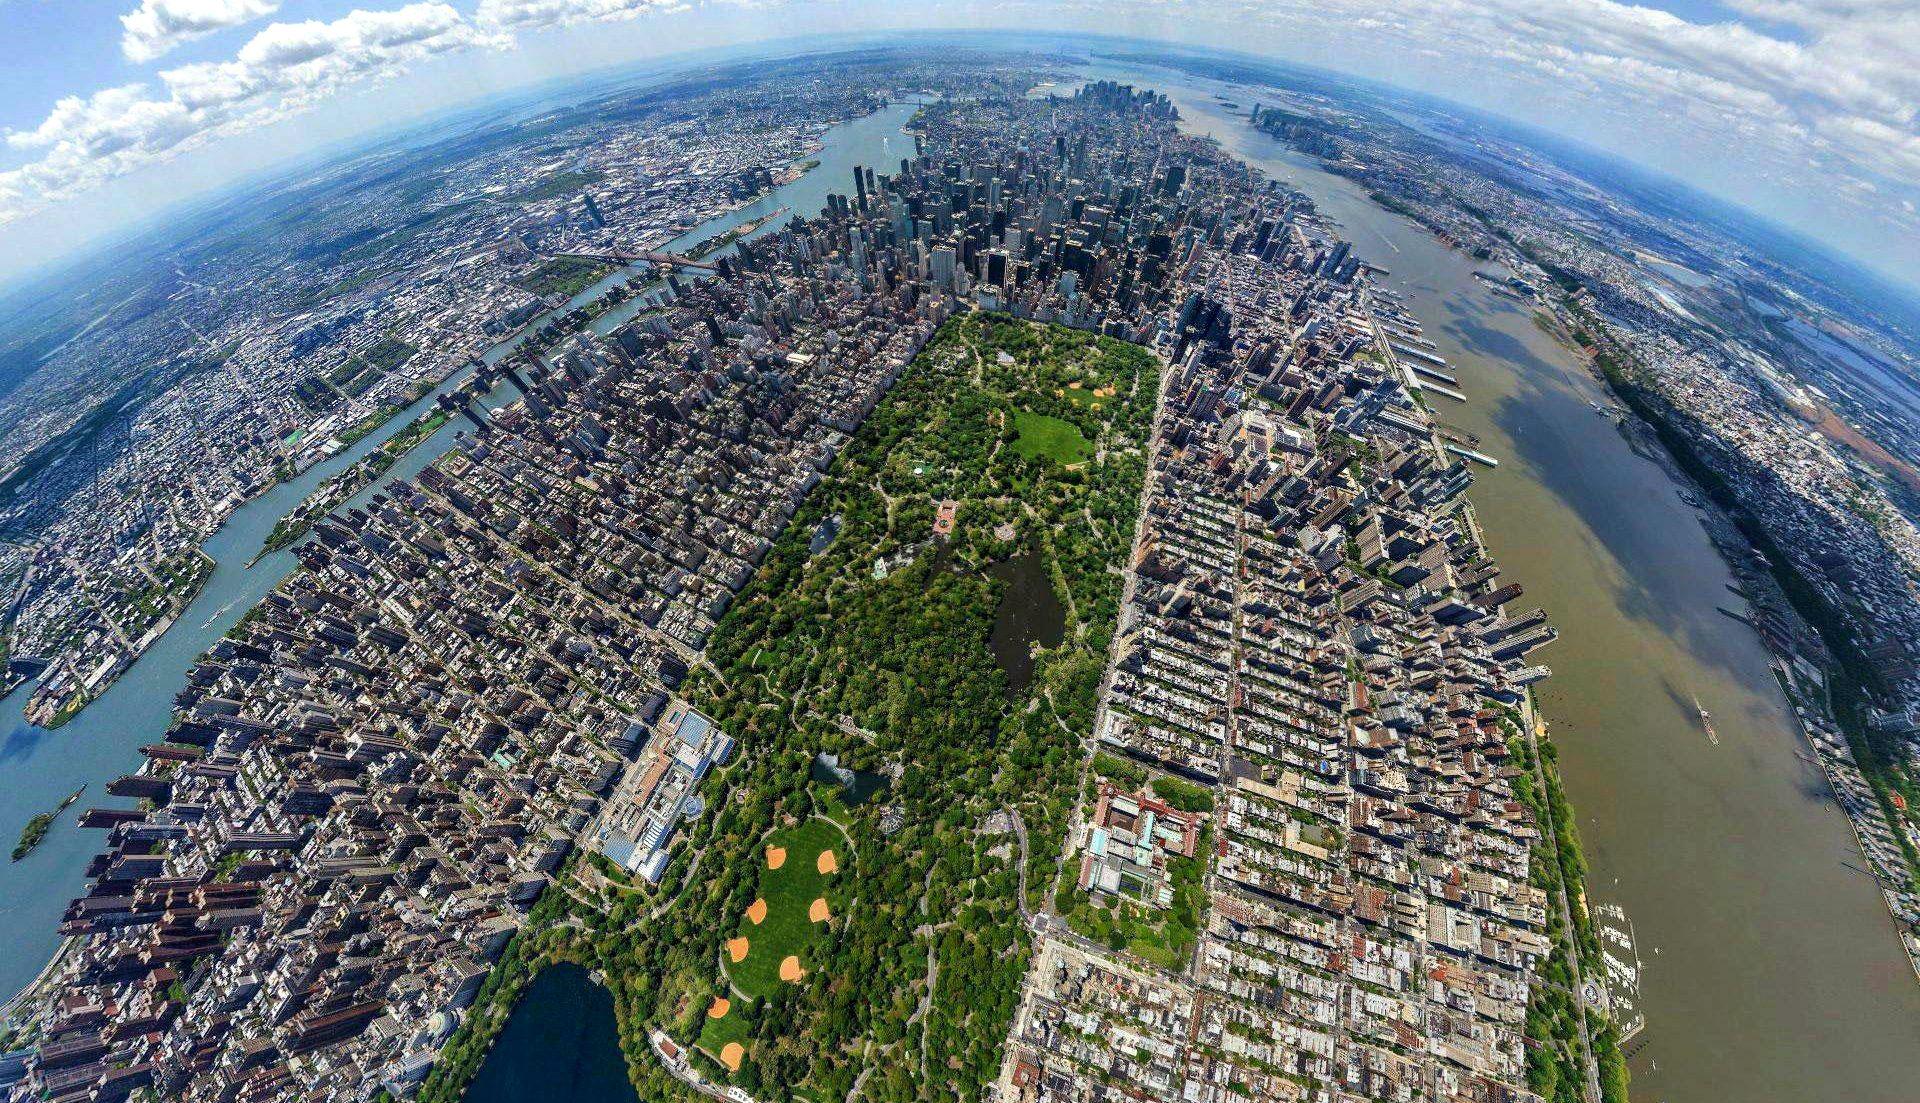 New York aerial